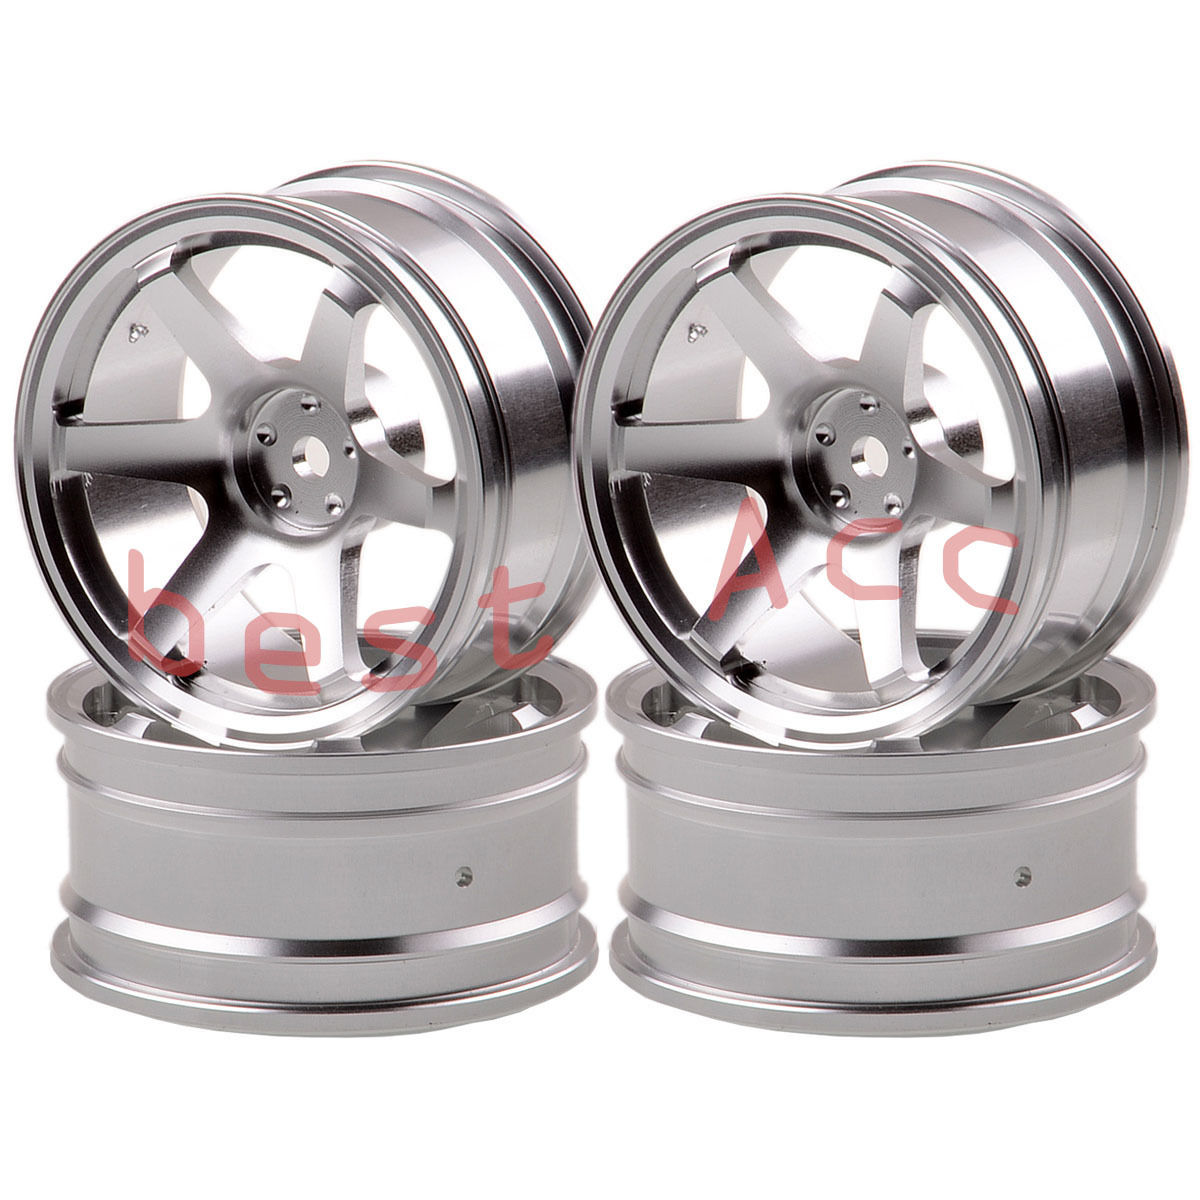 Remote Control Toys 4xwheel Rim 1052 Silver Aluminum 6 Spoke Rc 1/10 On-road Drift Sakura Hsp Tamiya To Assure Years Of Trouble-Free Service